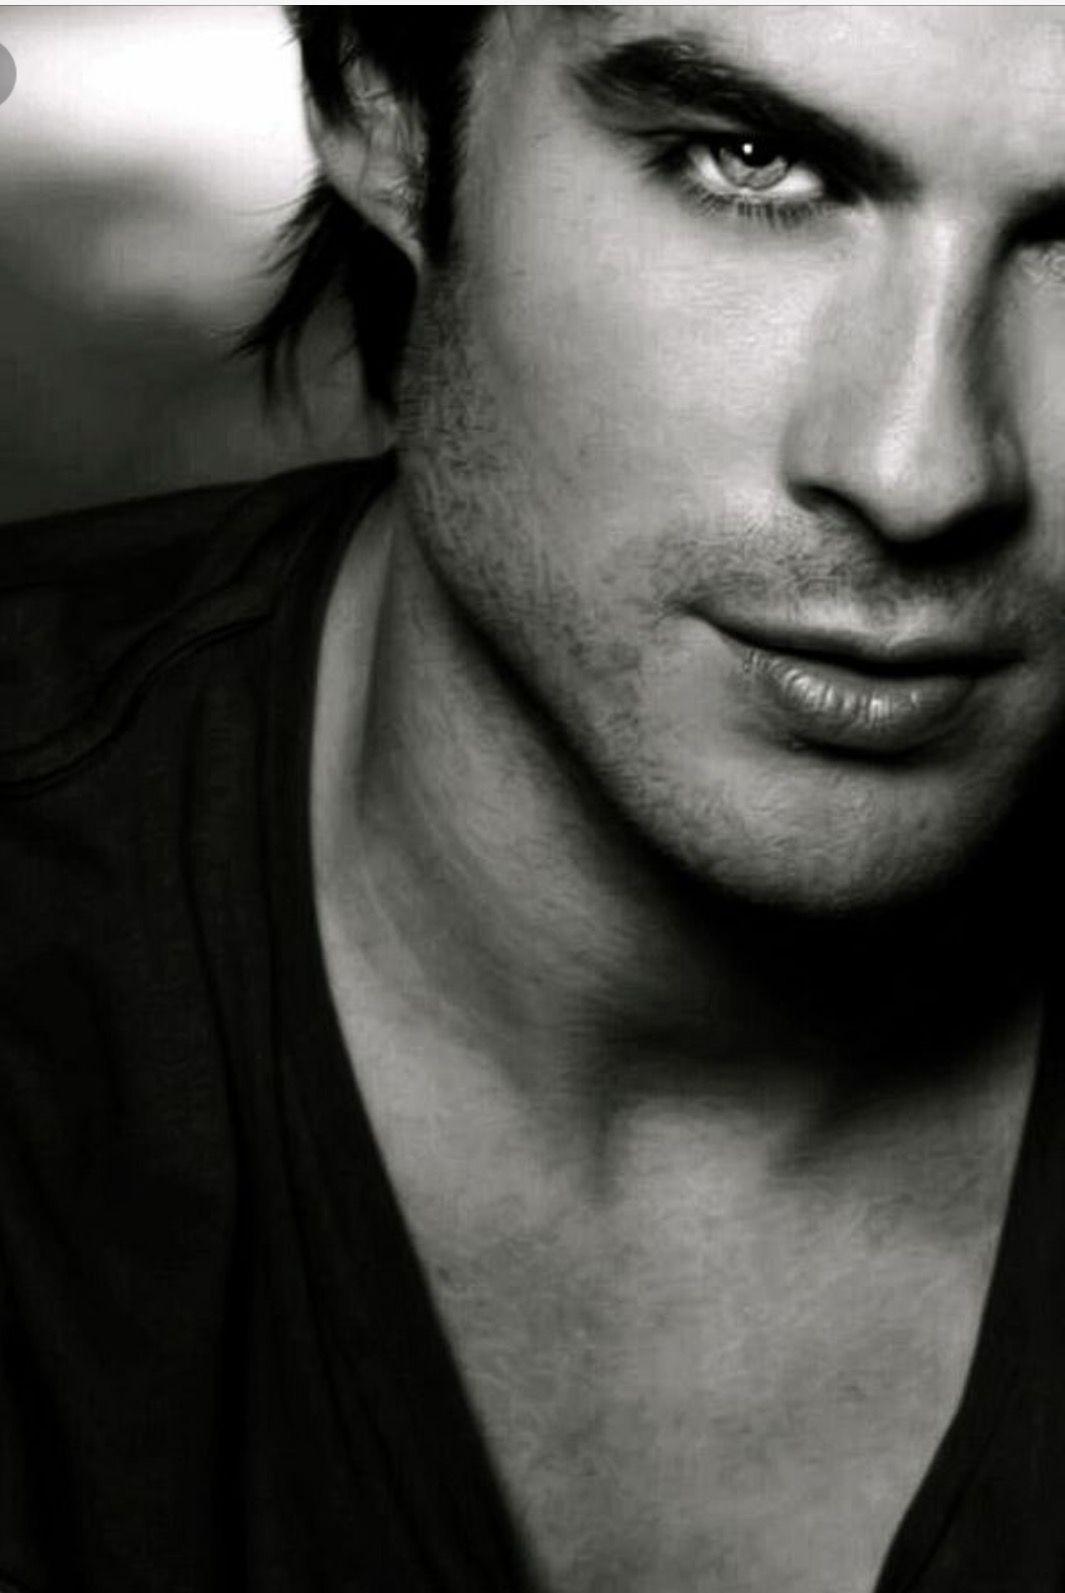 Ughhhh he's so sexy!! ☺️😭